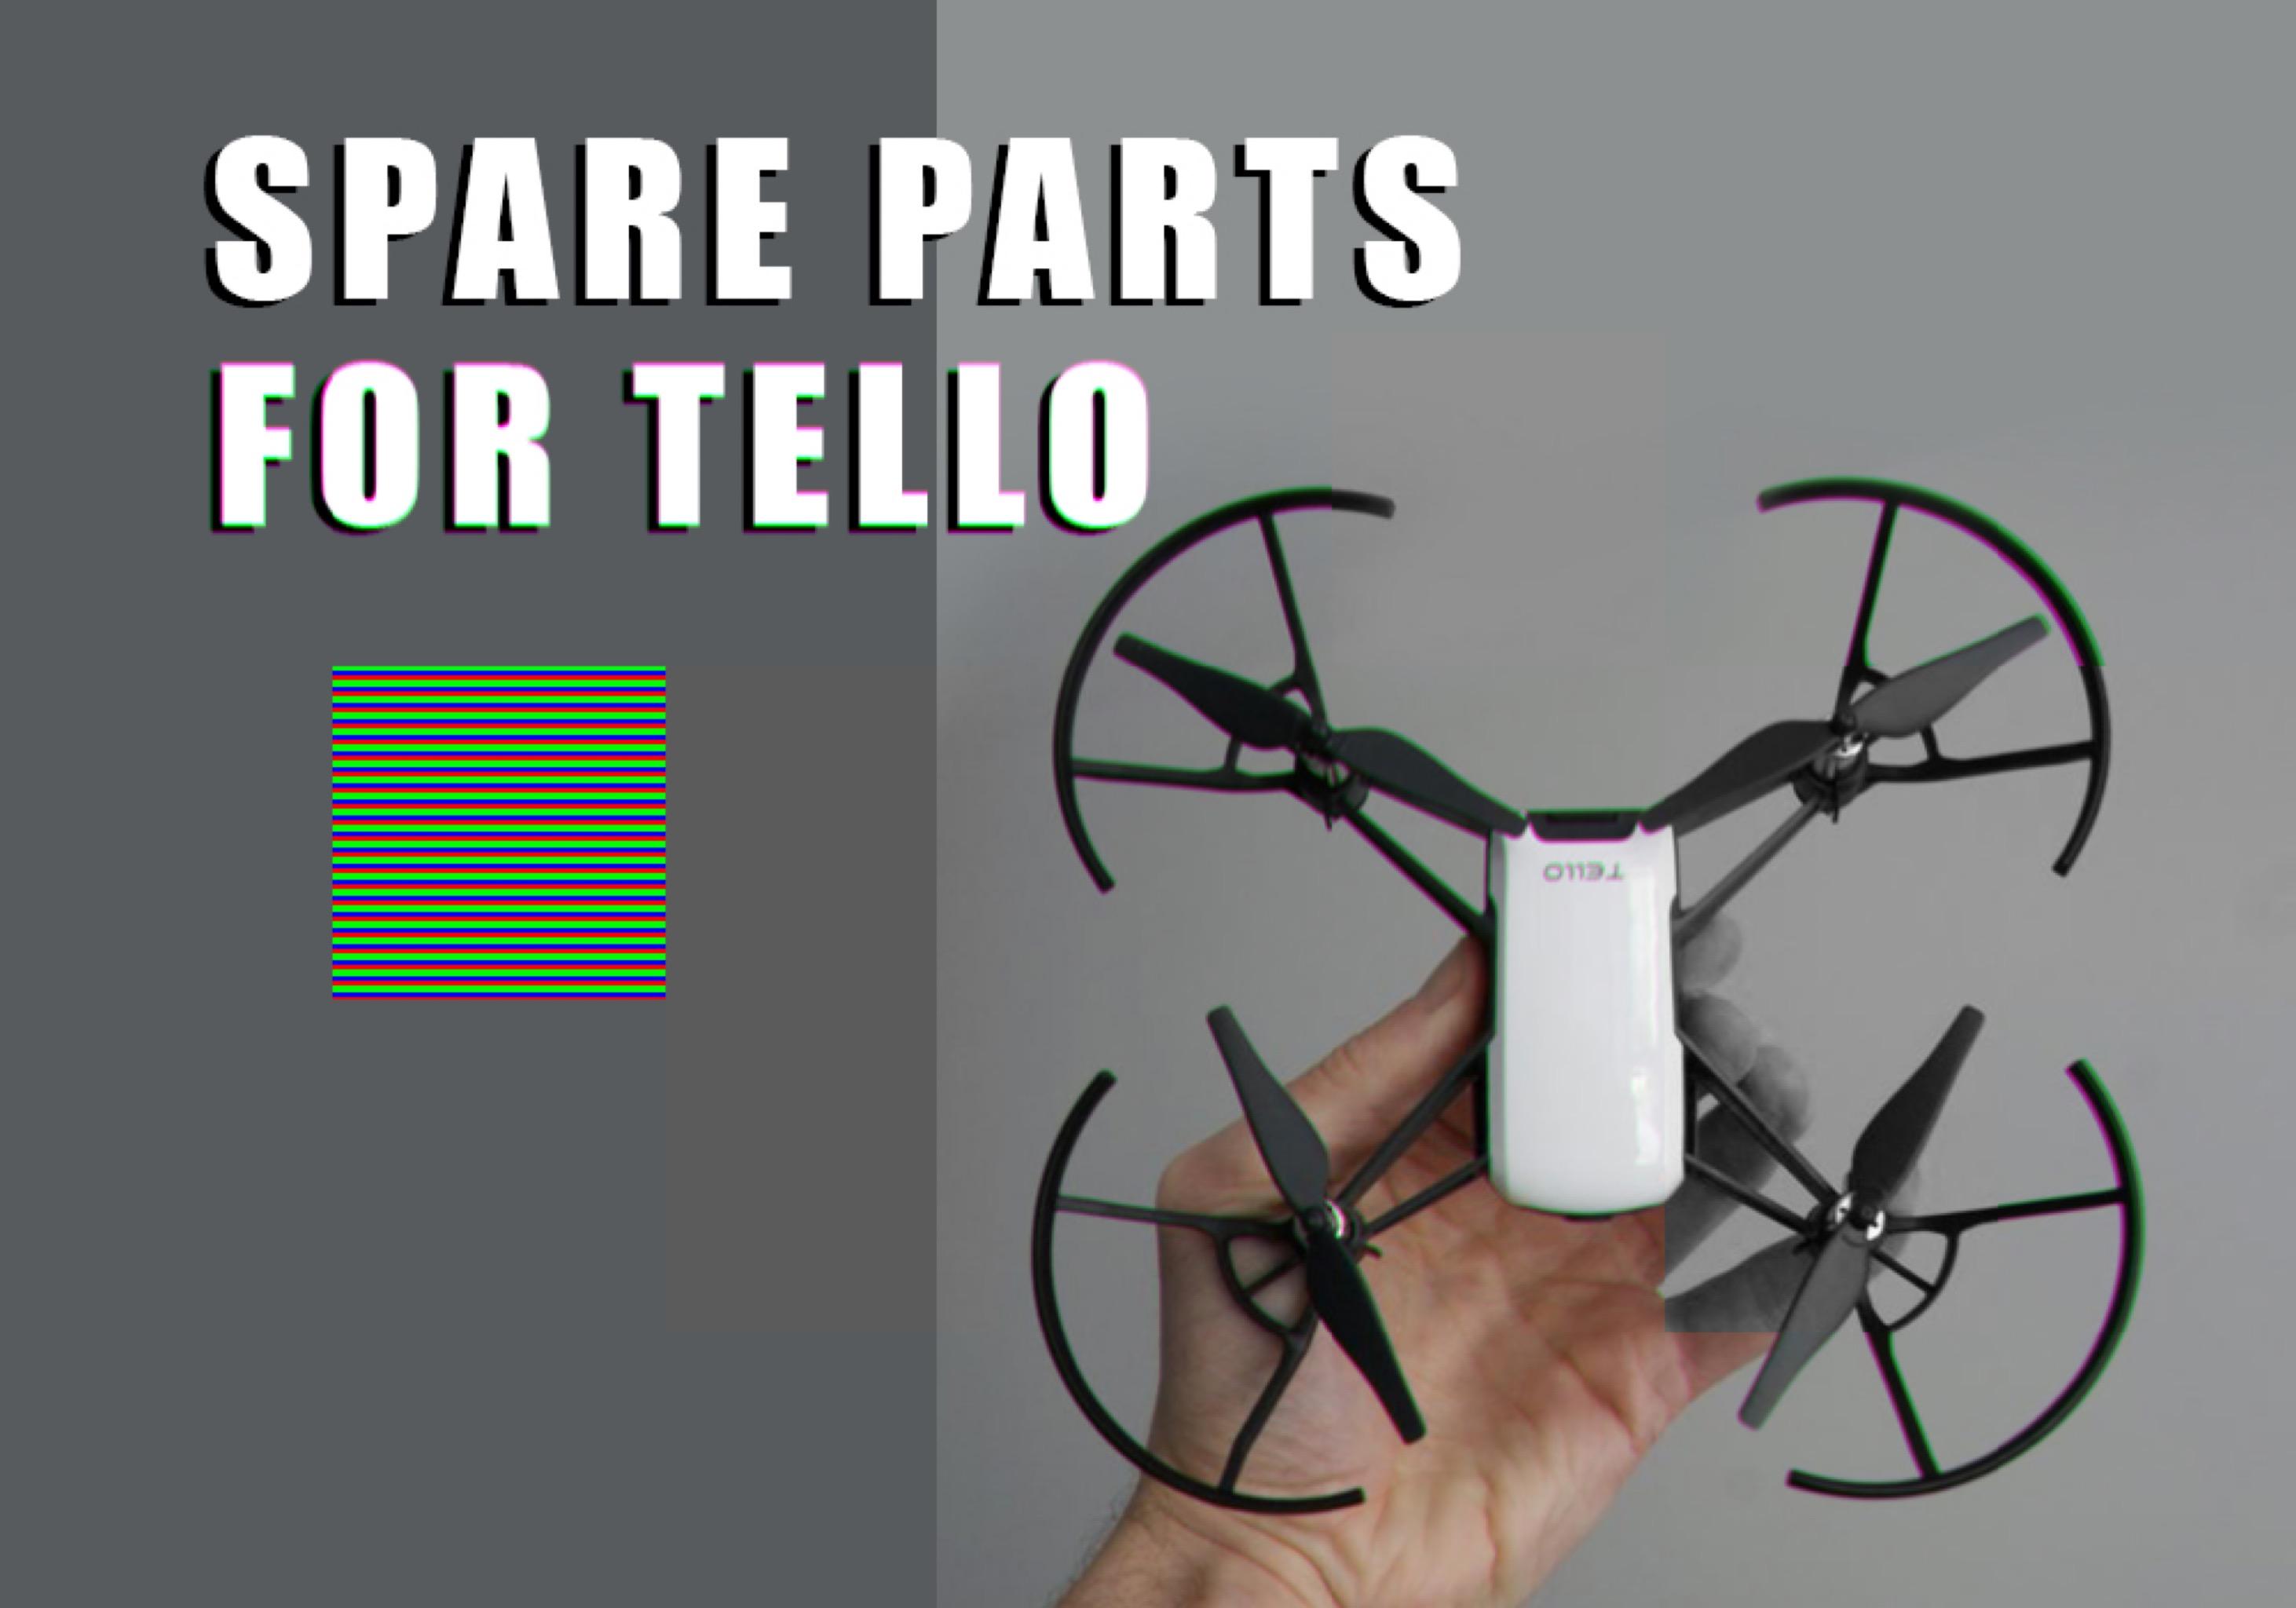 Spare Parts for Tello - Dji Ryze Tello Fun Blog